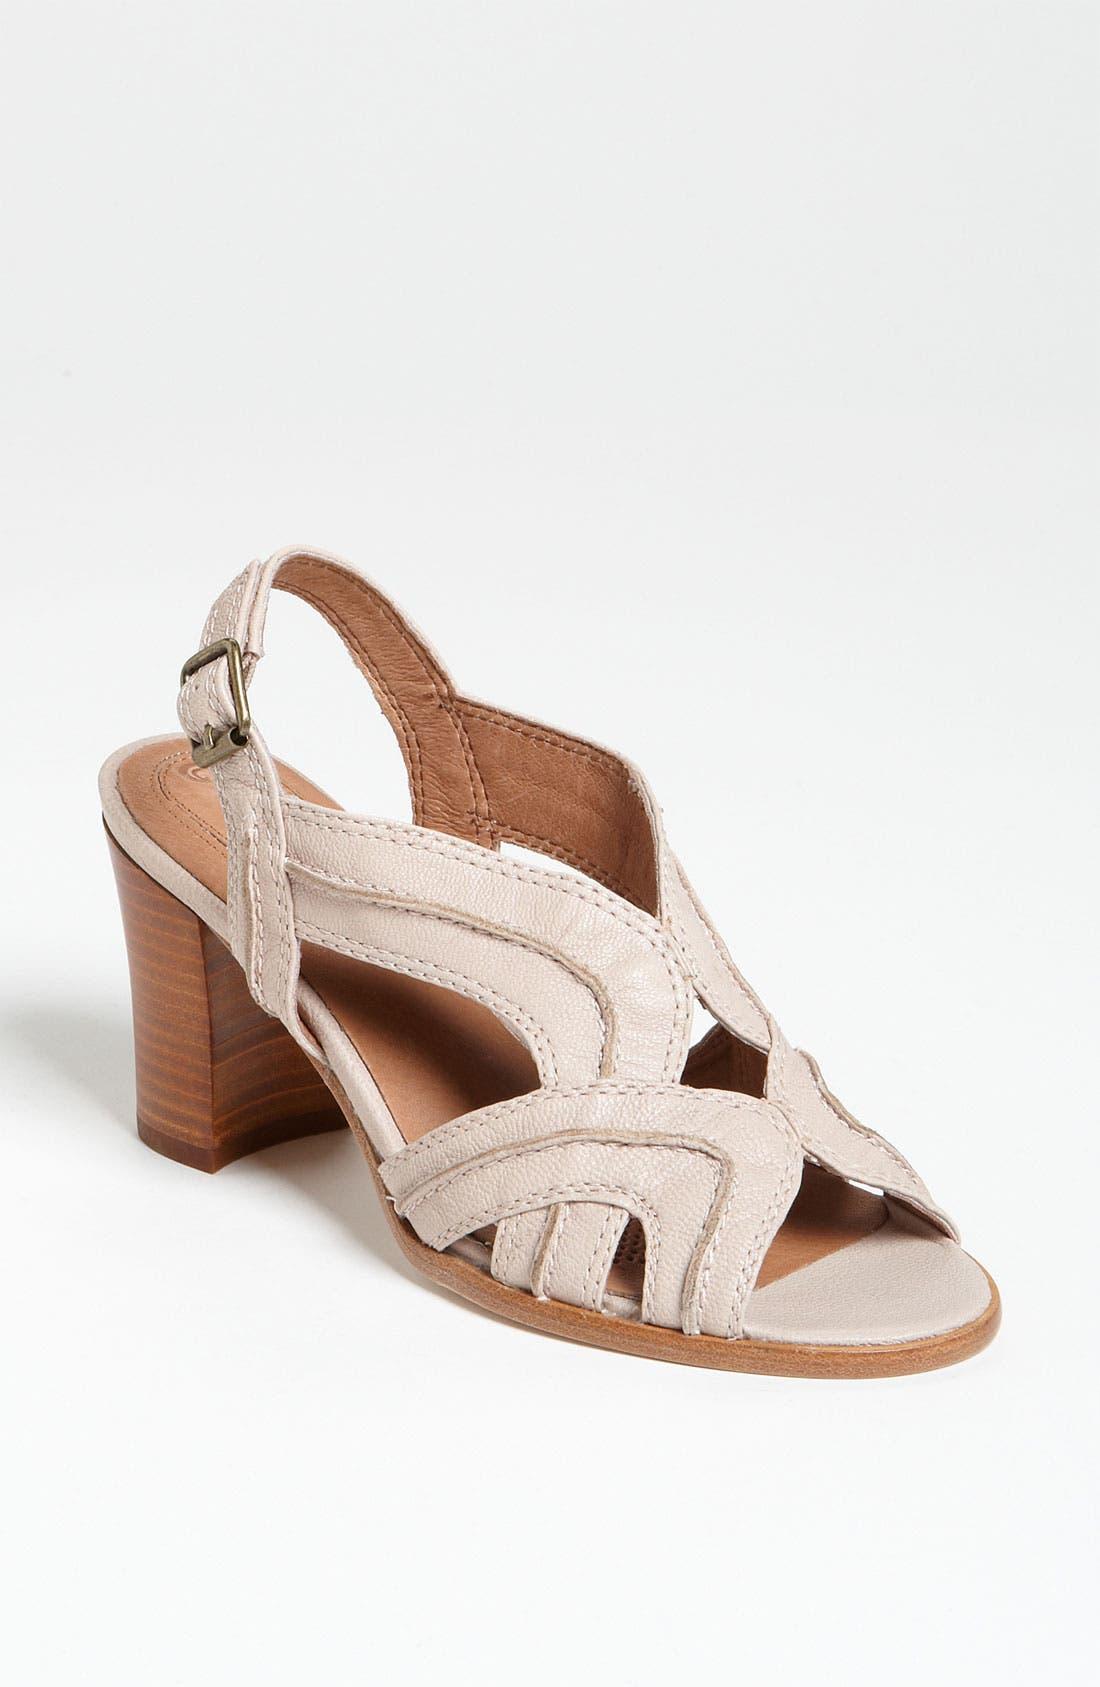 Alternate Image 1 Selected - Corso Como 'Davinci' Sandal